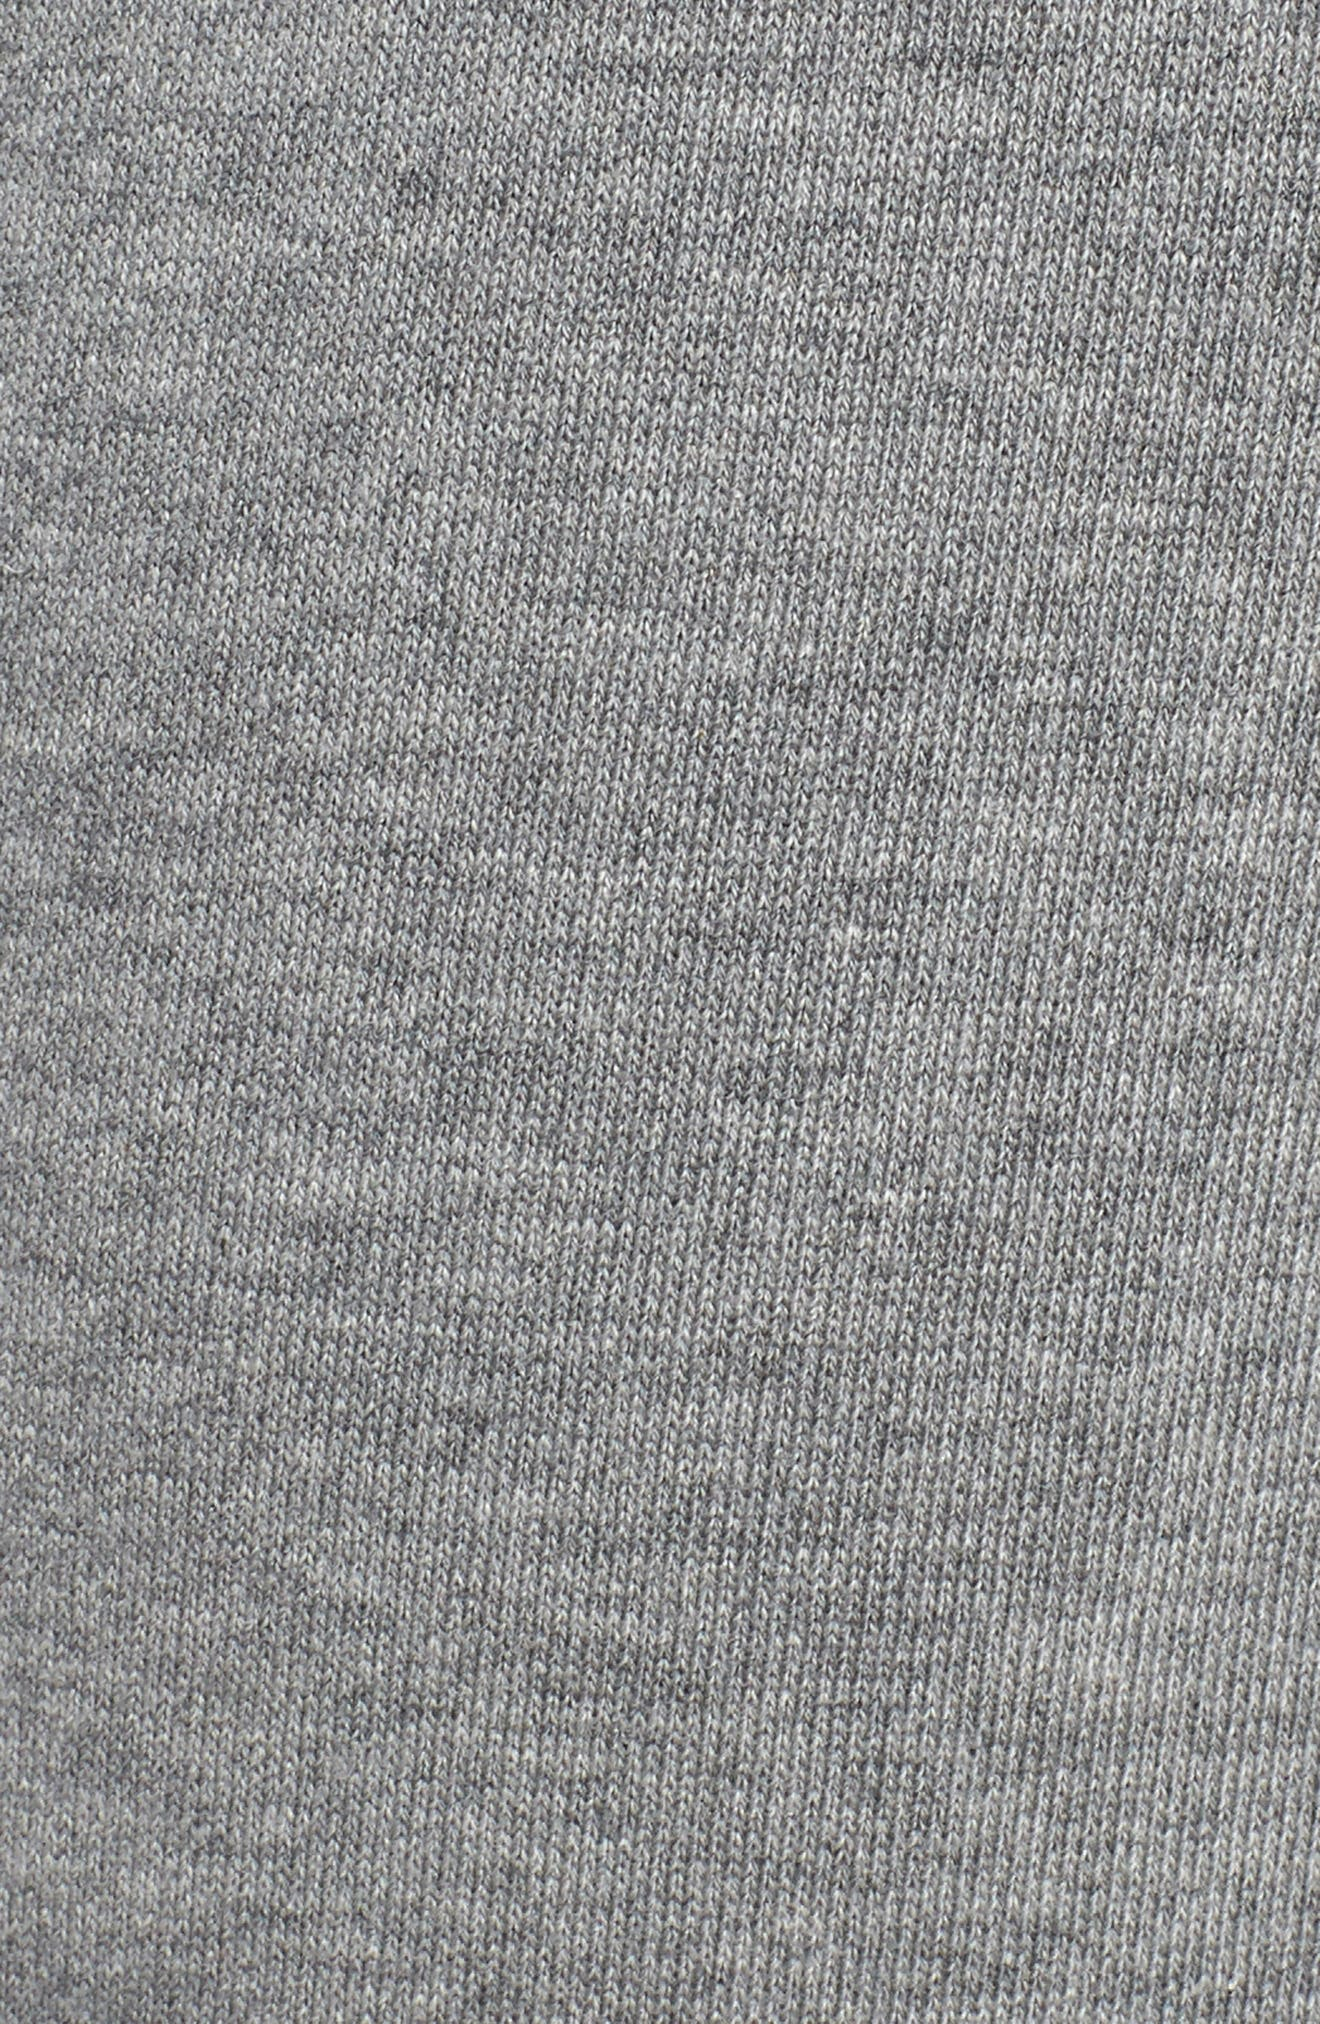 Loud Pack Cotton Sweatpants,                             Alternate thumbnail 5, color,                             MEDIUM GRAY HEATHER